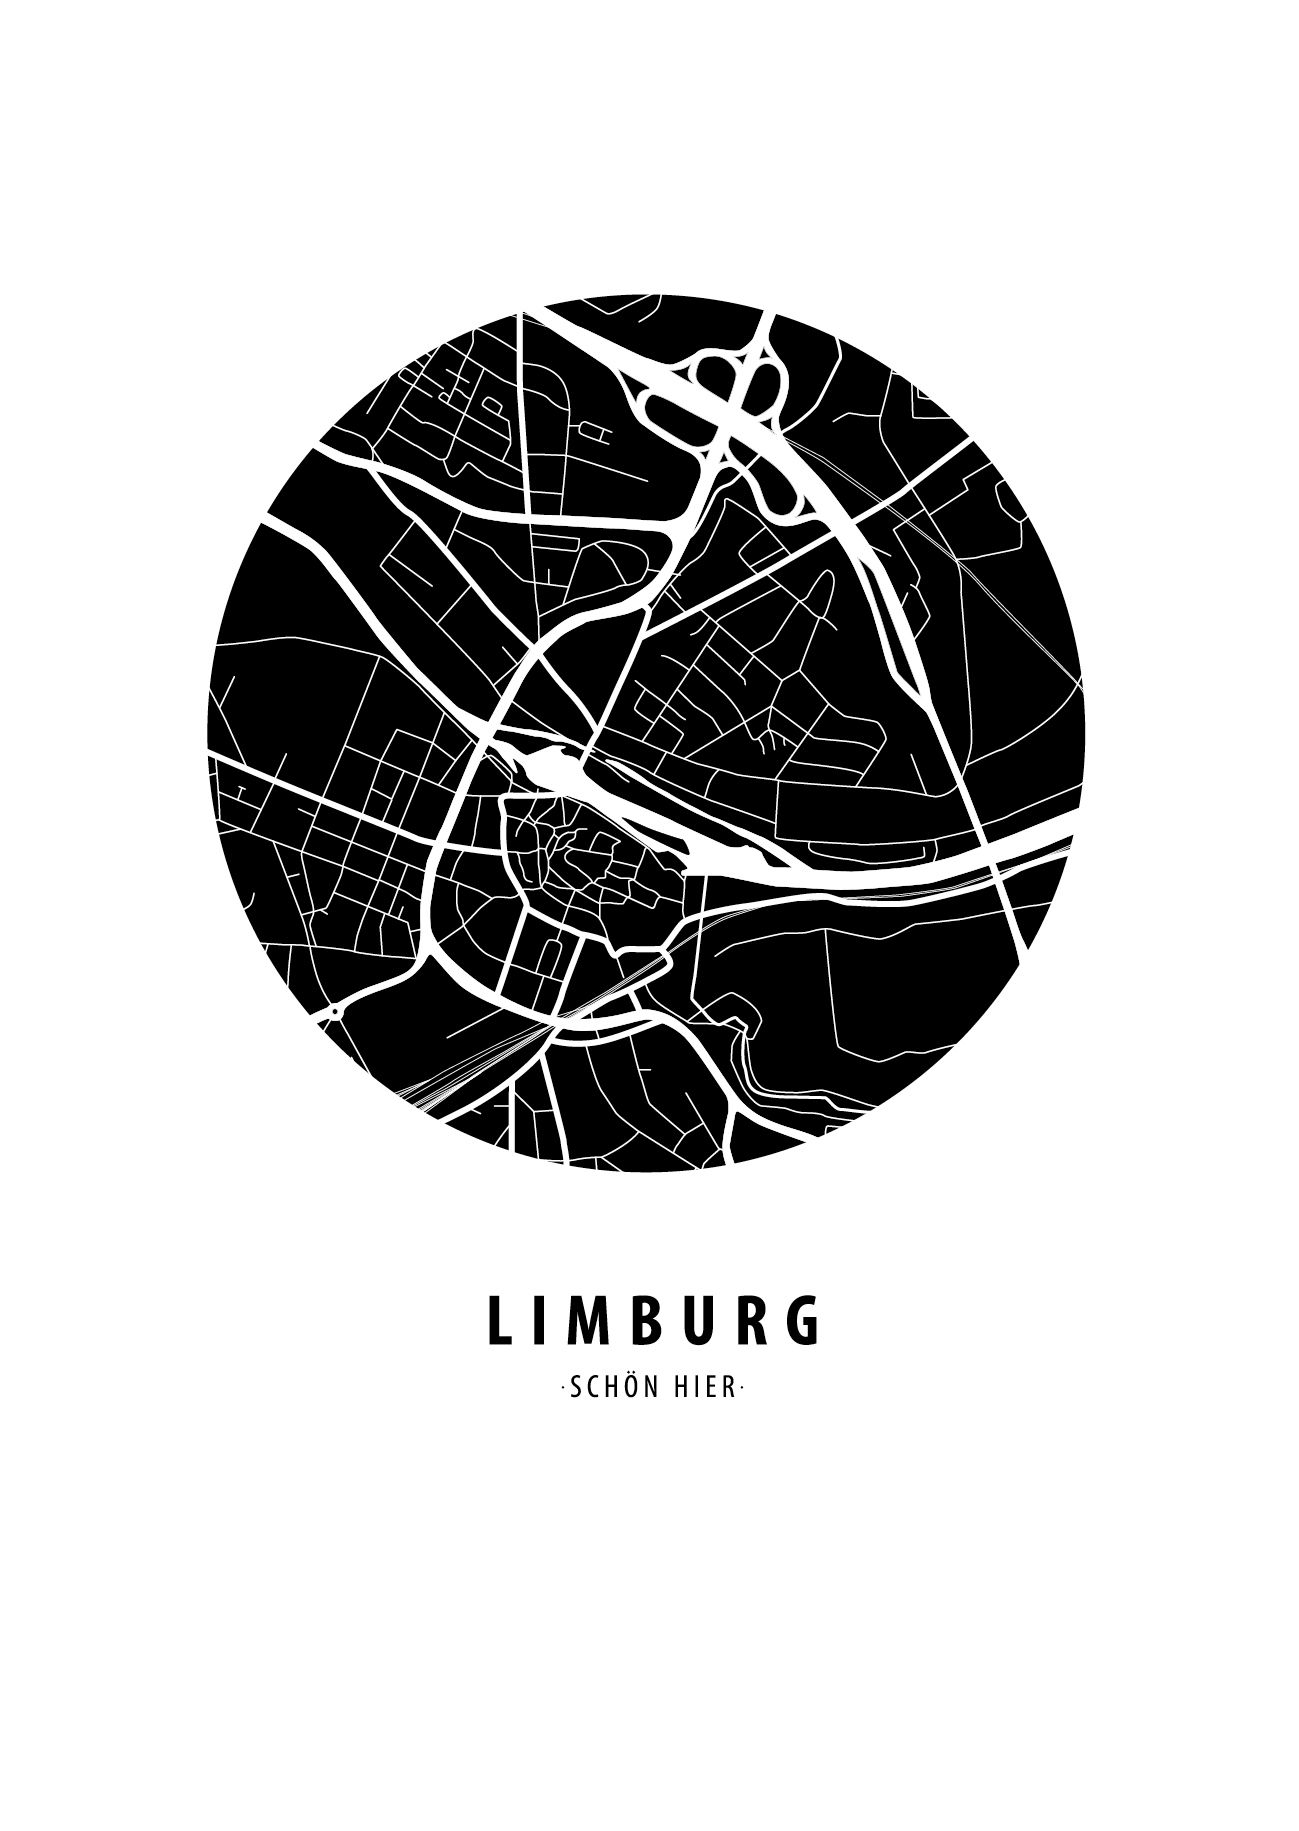 LIV MATTHIESEN LIMBURG